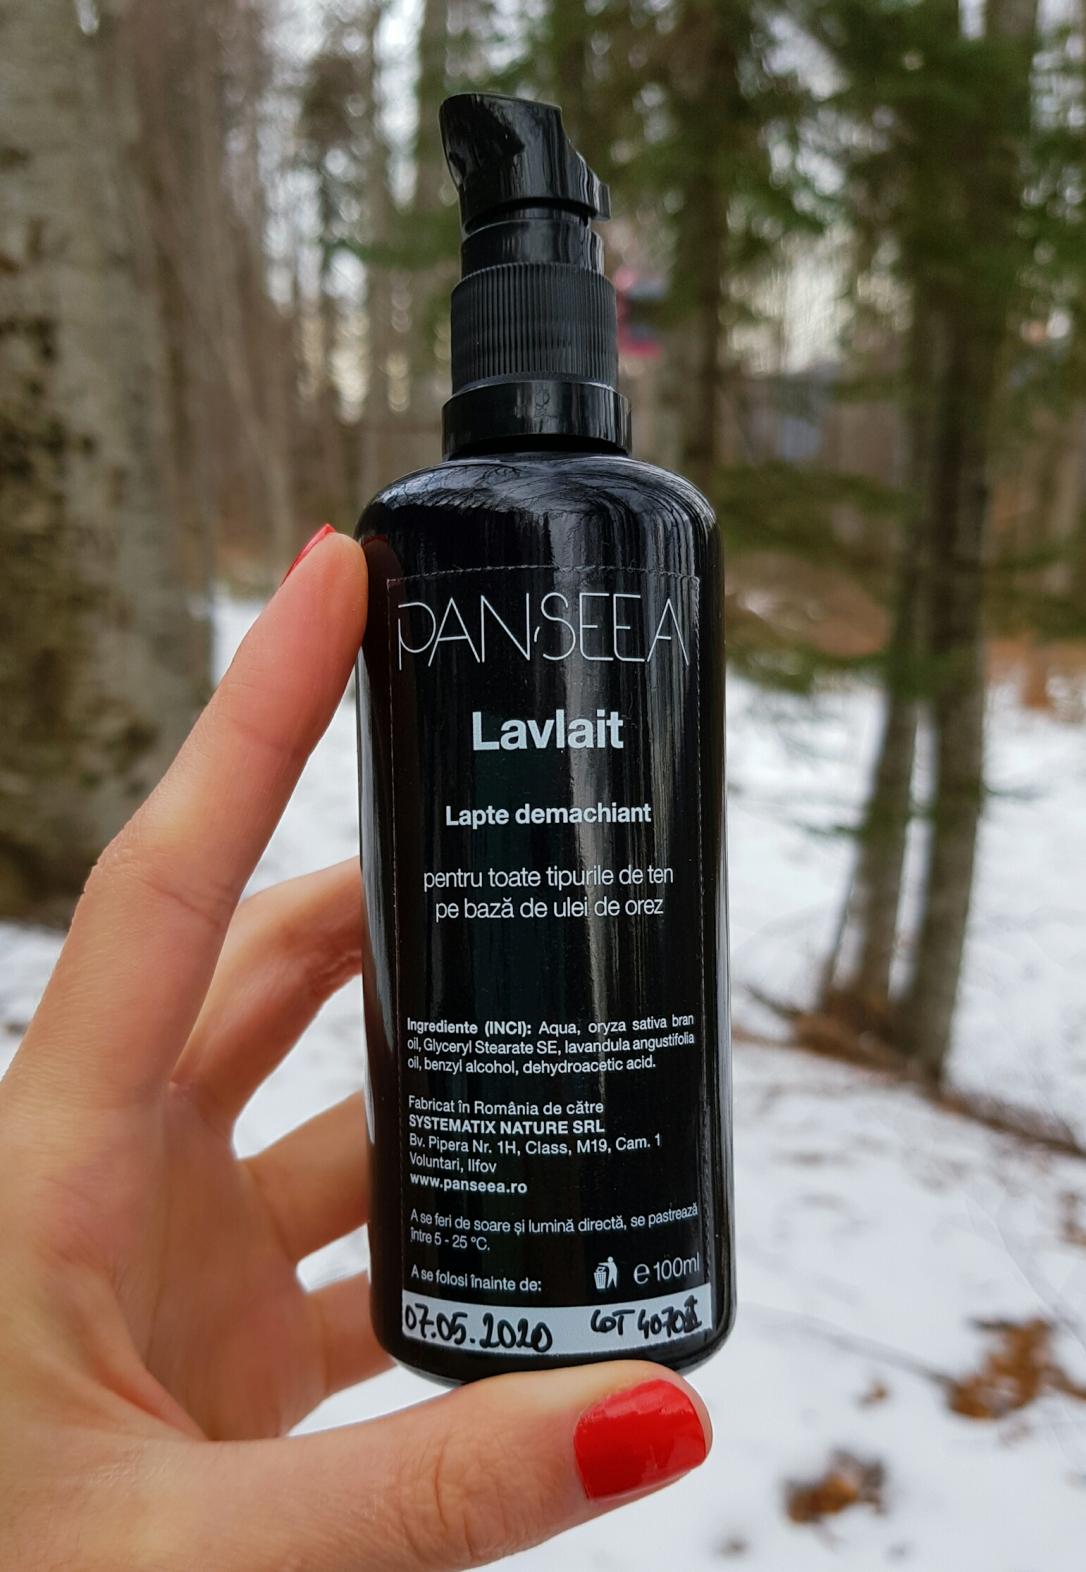 Demachiant vegan, cleanser, Panseea, Lavlait, cruelty-free